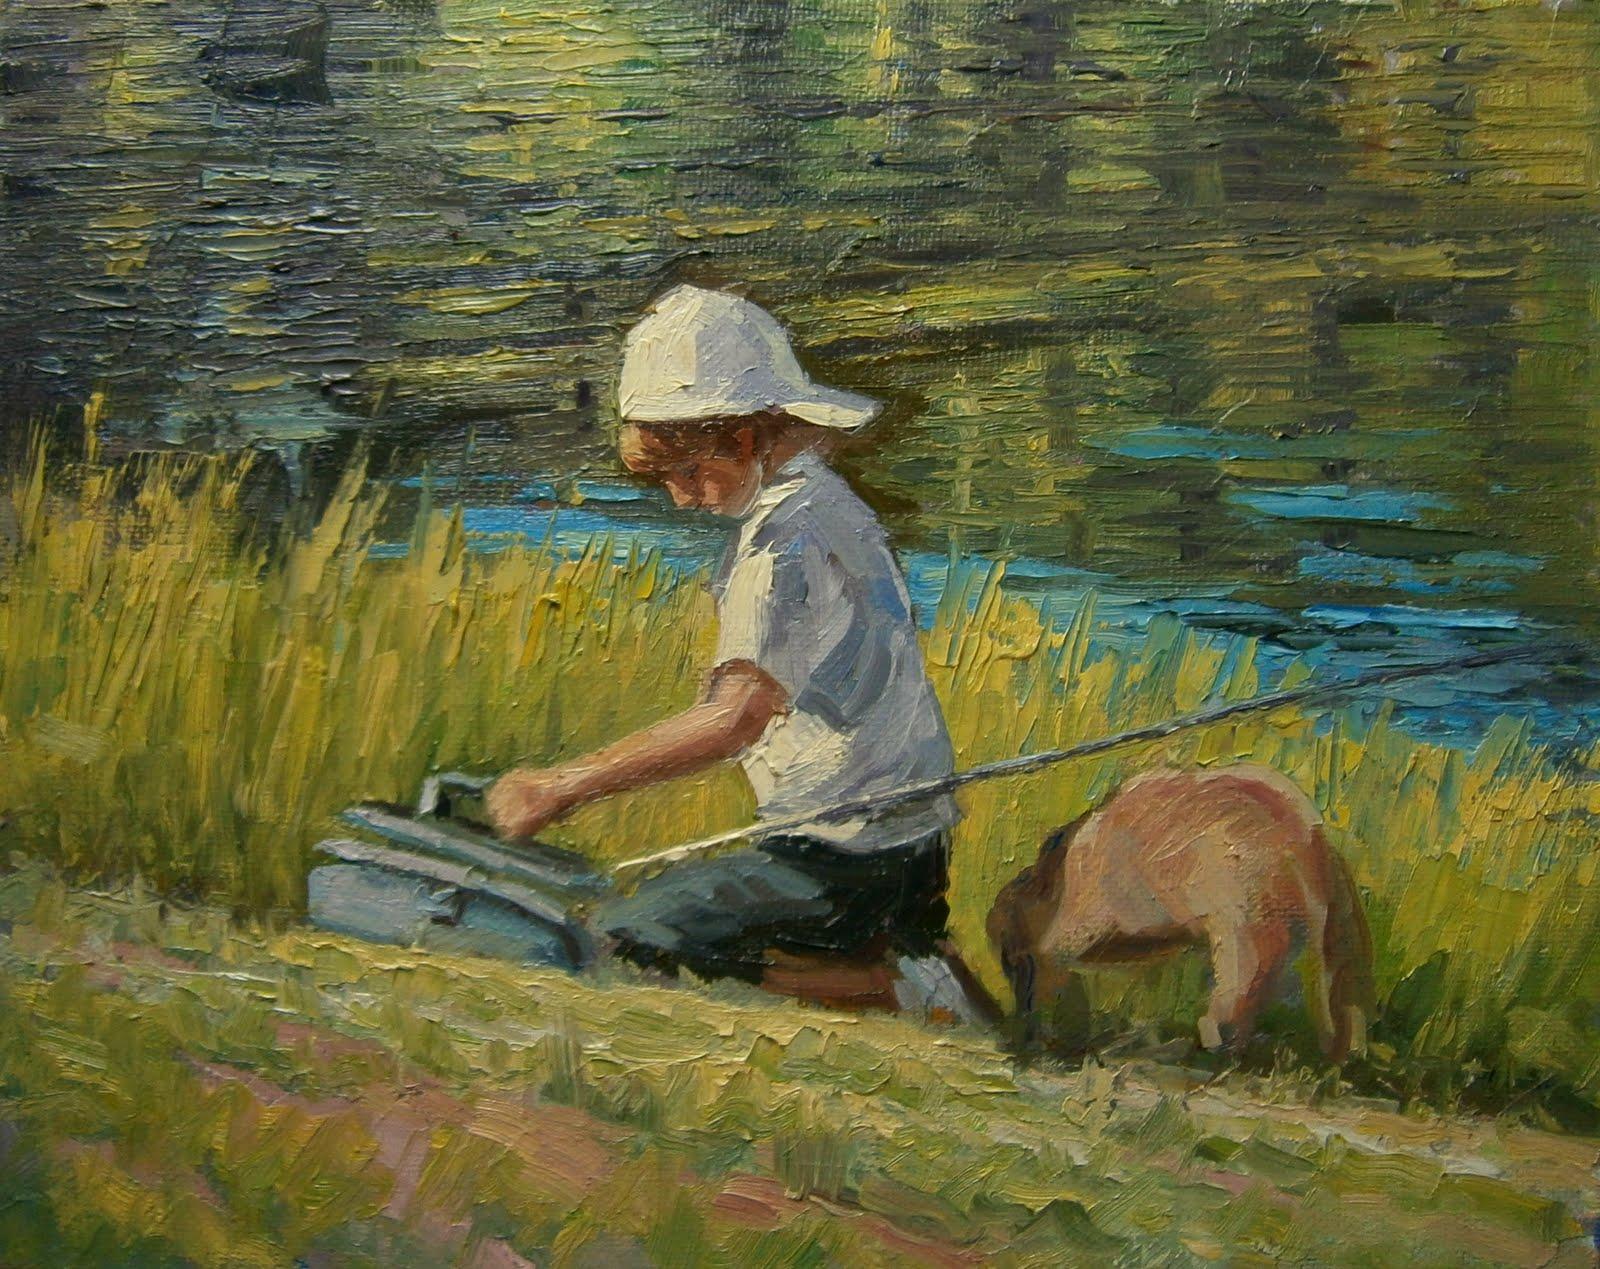 Omaž ribolovcu i ribolovu - Page 3 Summer+2011+425